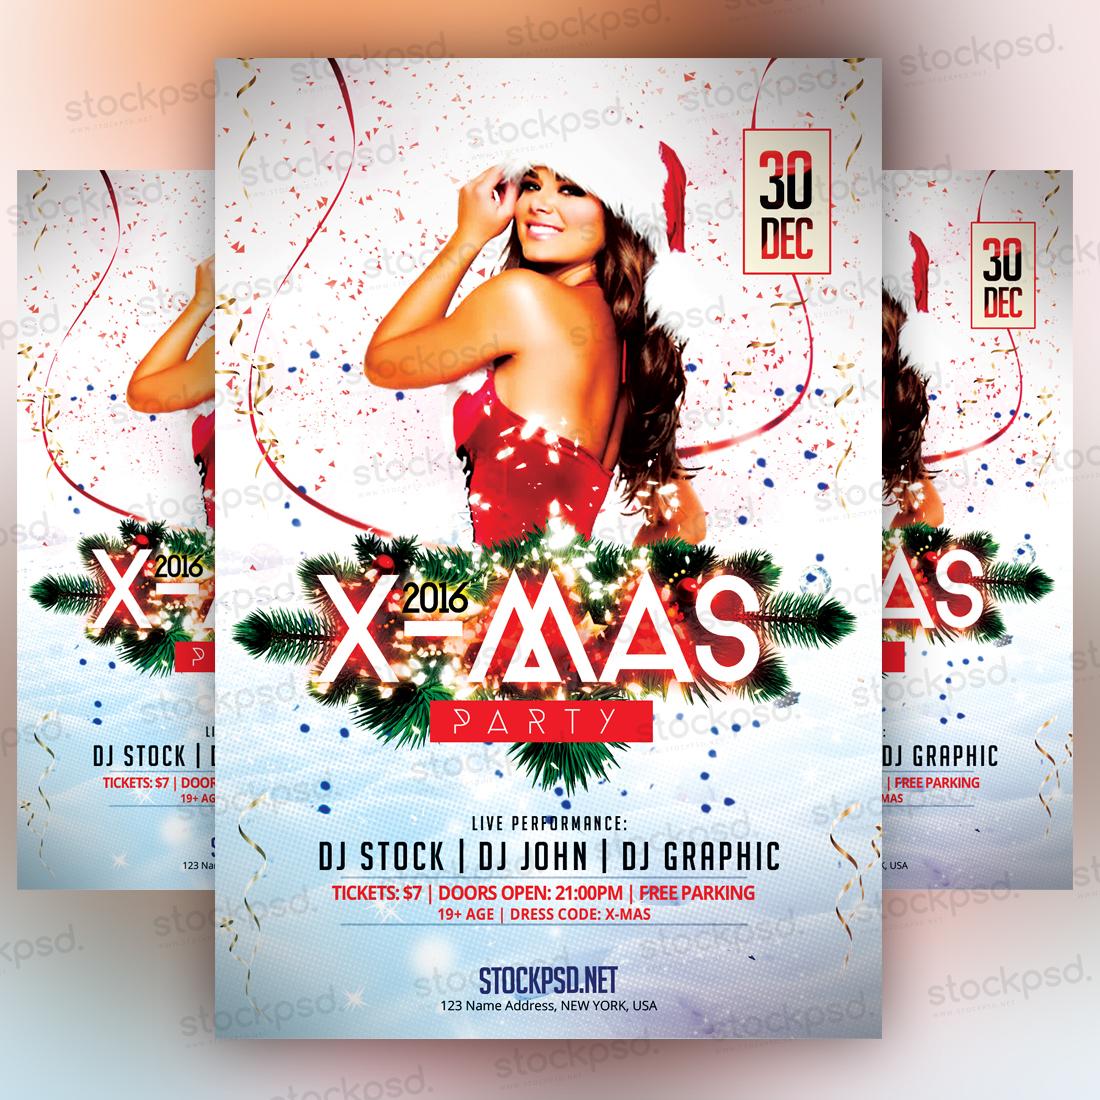 X Mas Party 2016 Freebie Psd Flyer On Behance